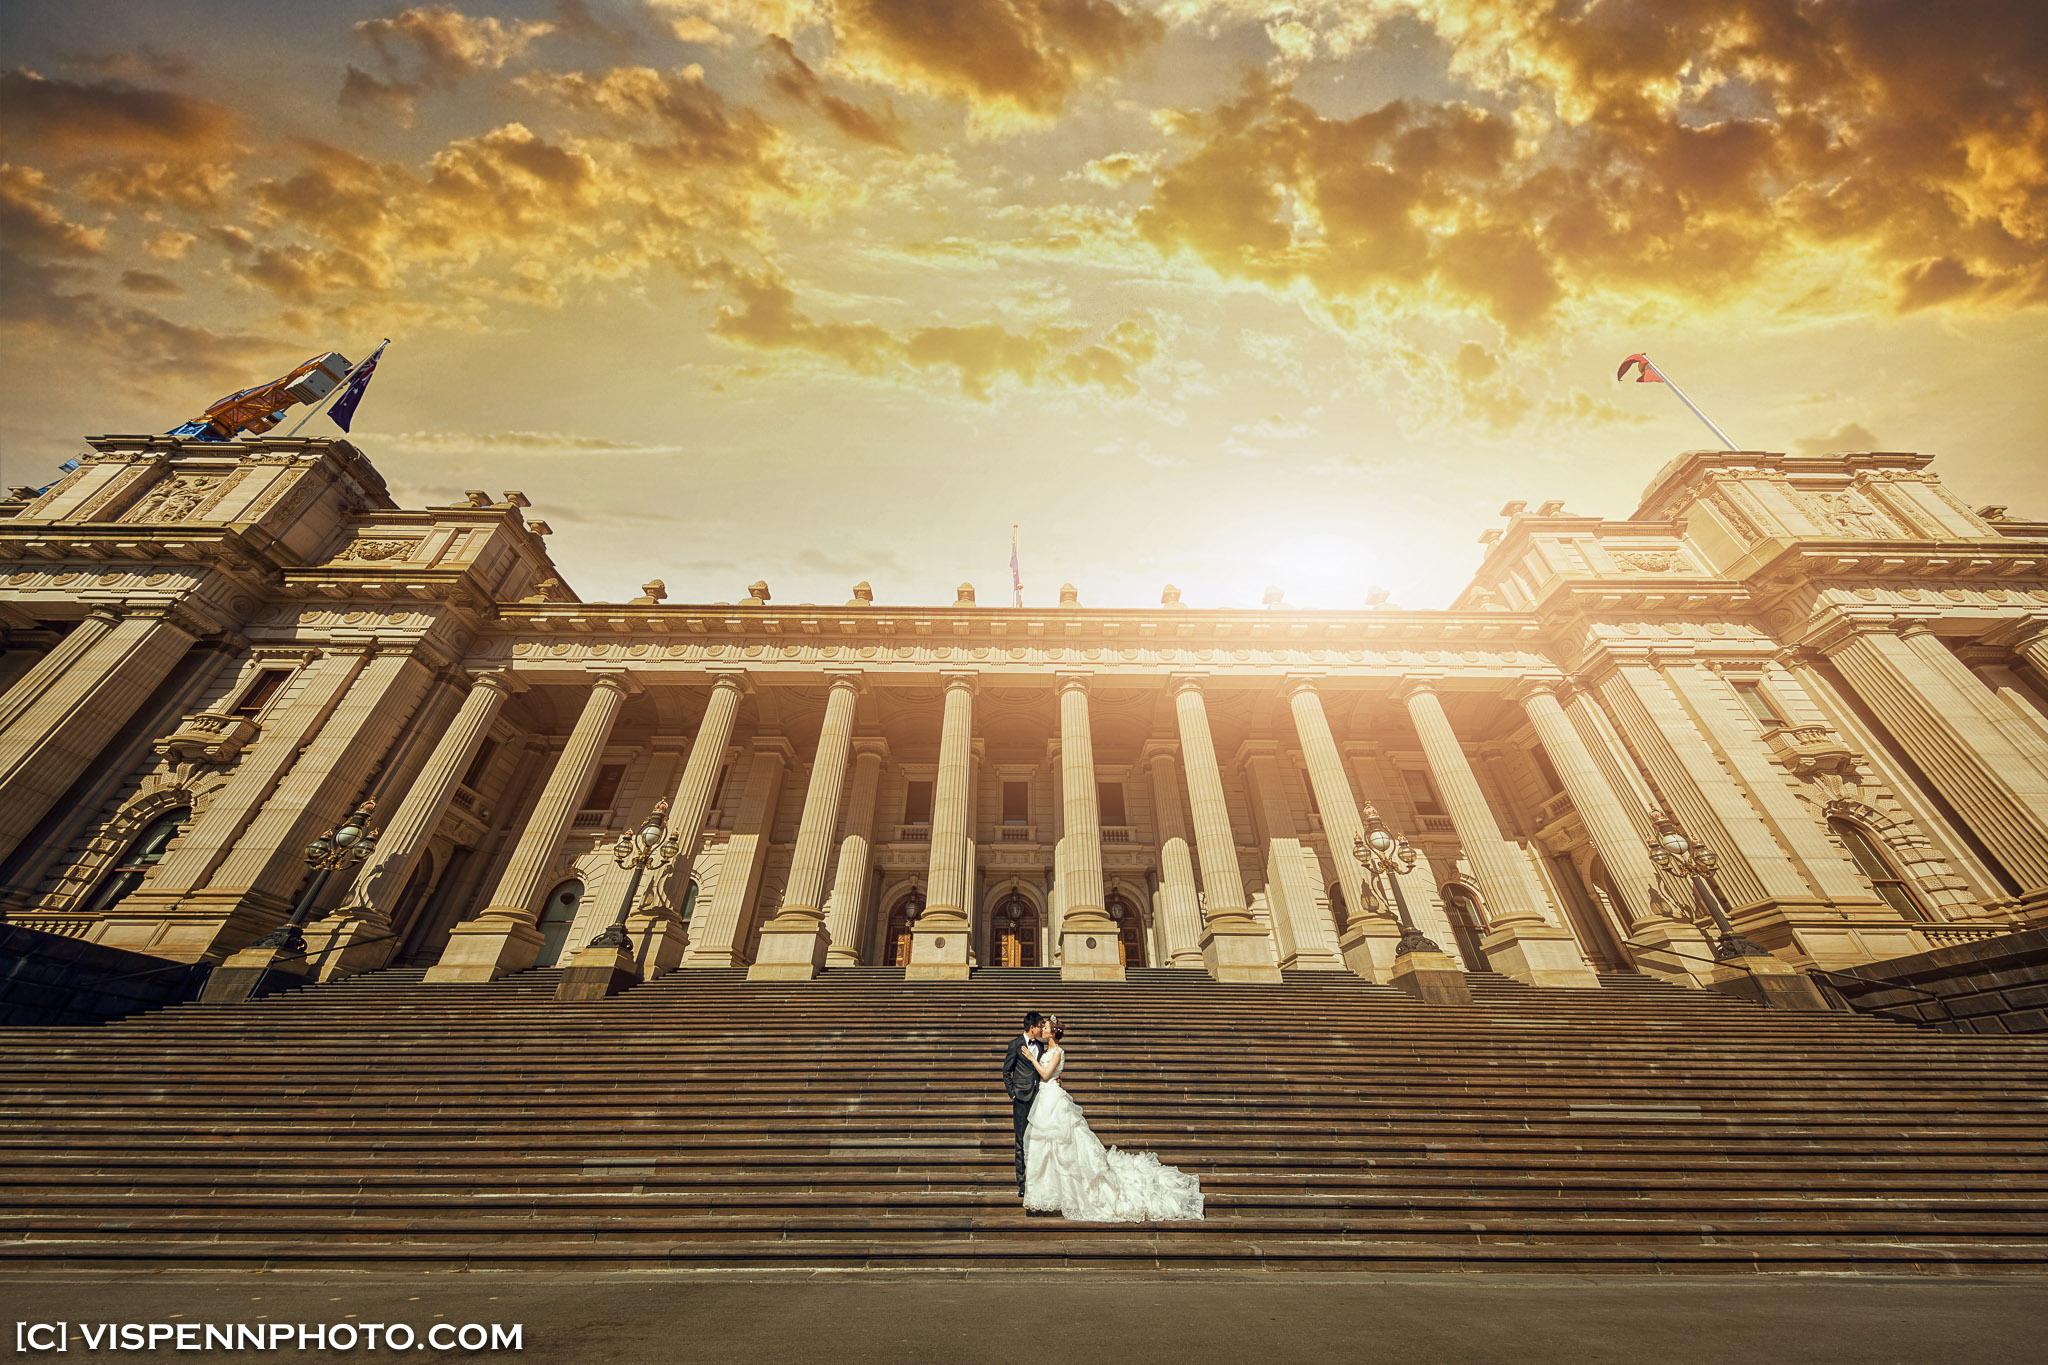 PRE WEDDING Photography Melbourne VISPENN 墨尔本 婚纱照 结婚照 婚纱摄影 VISPENN AllenWang 1655 1